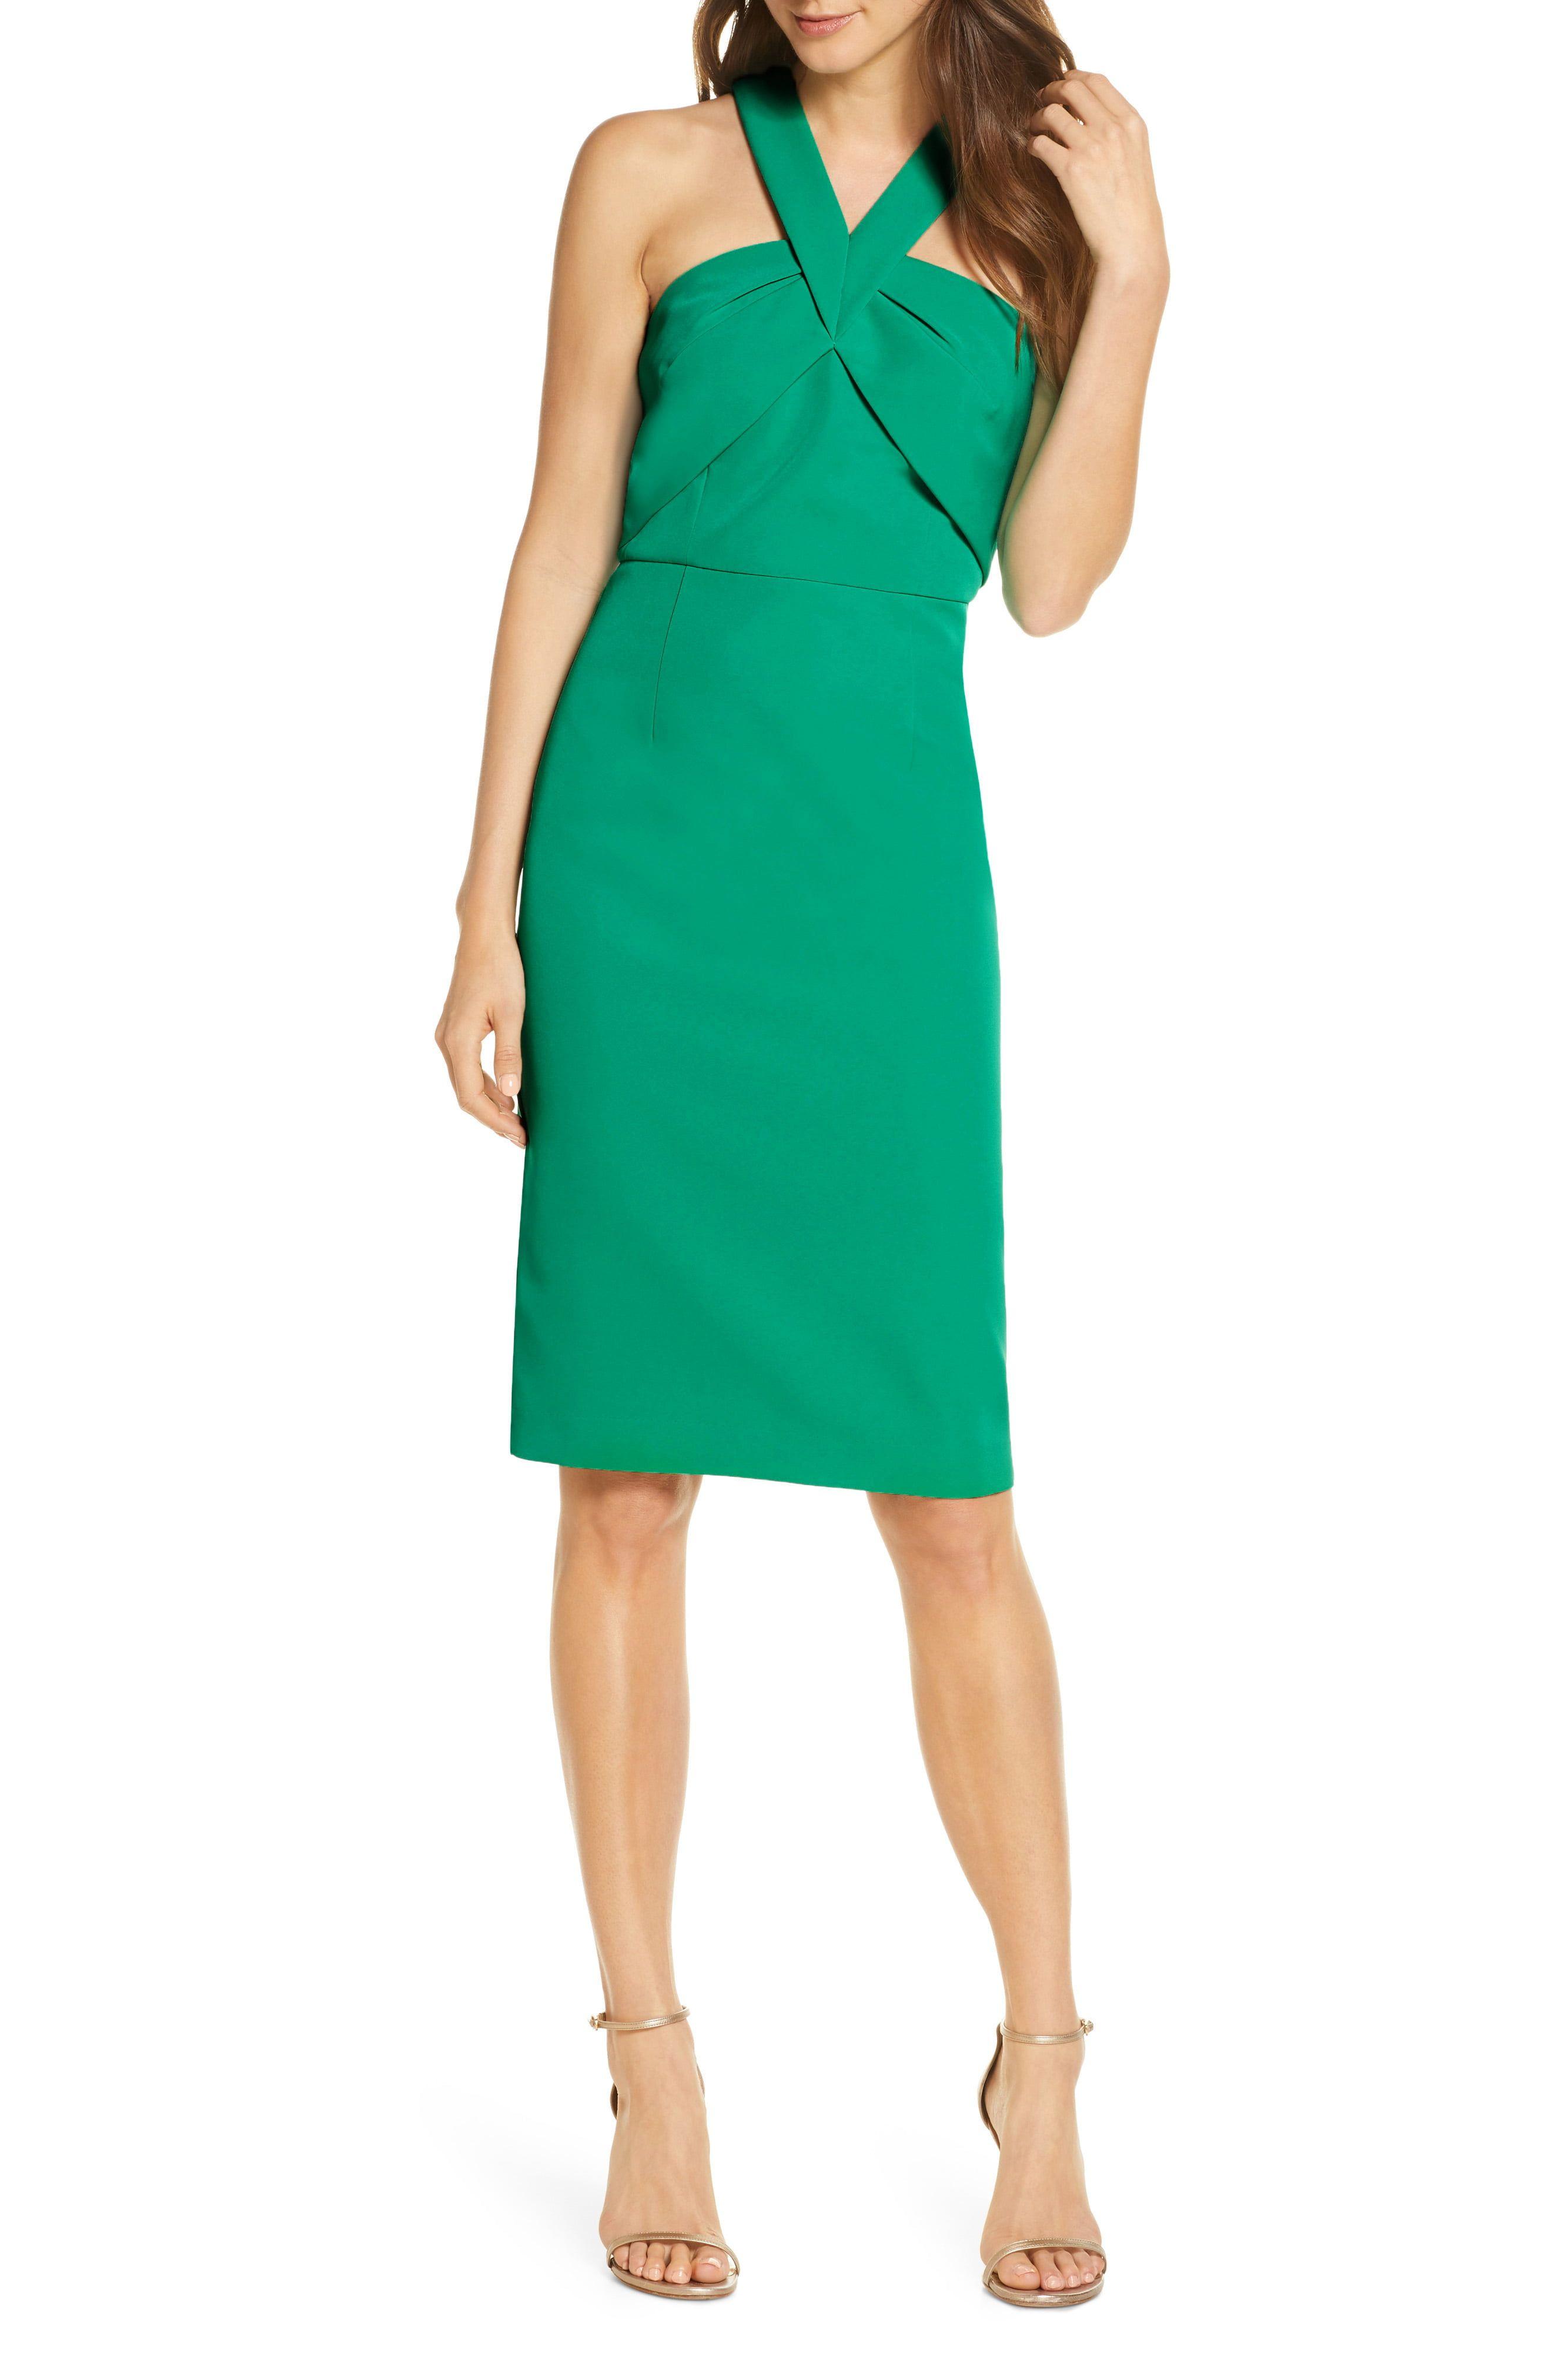 Vince Camuto Halter Neck Sleeveless Dress Nordstrom Long Sleeve Cocktail Dress Nordstrom Dresses Dresses [ 4048 x 2640 Pixel ]